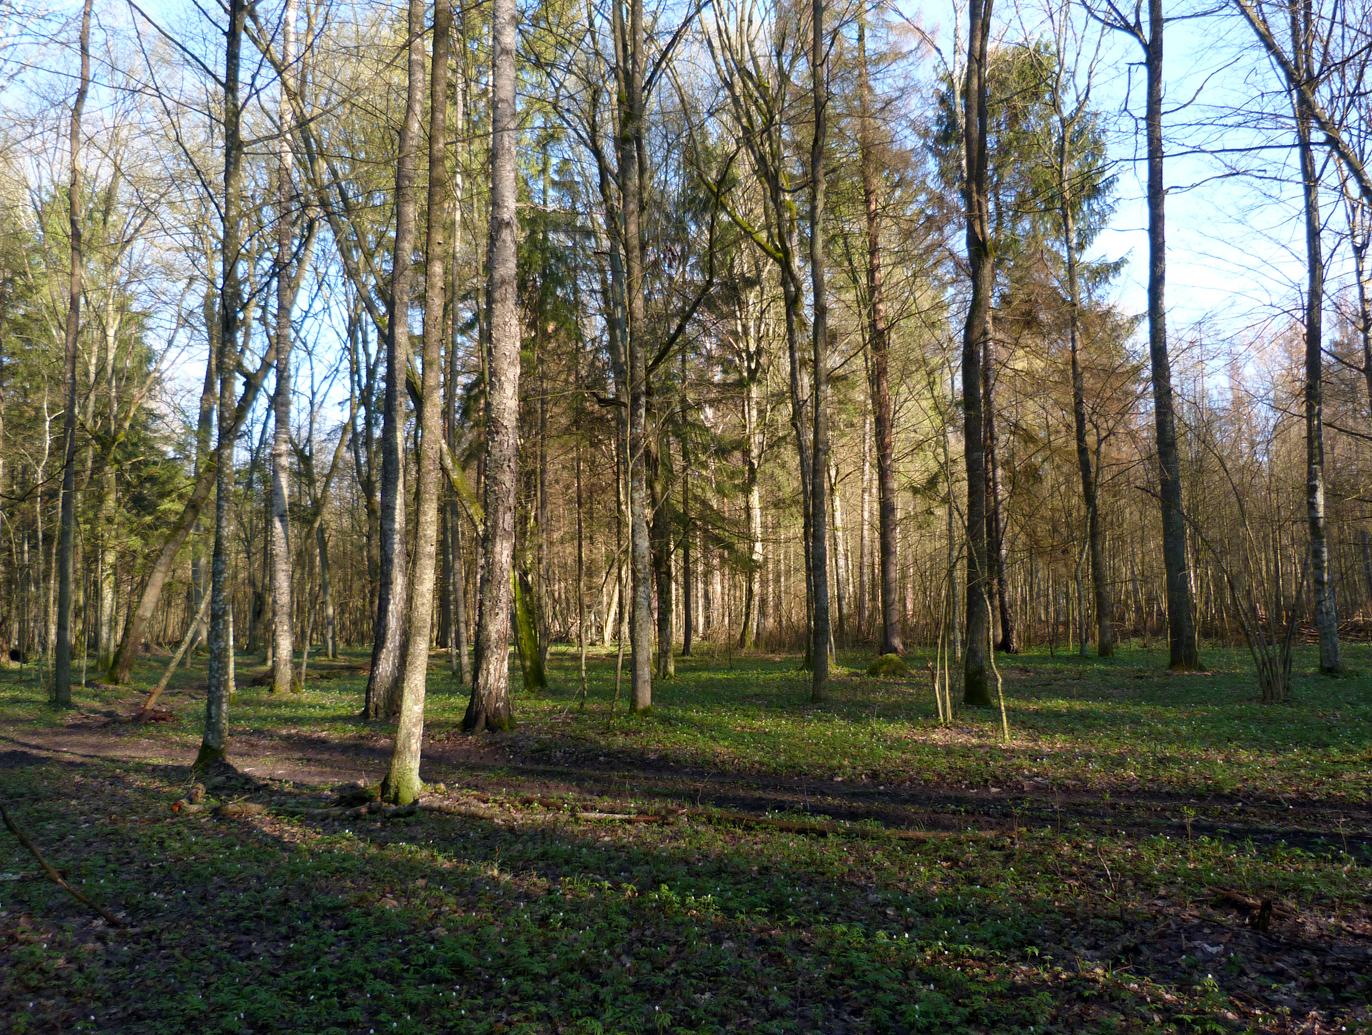 Deep in the forest - Hazel Grouse habitat